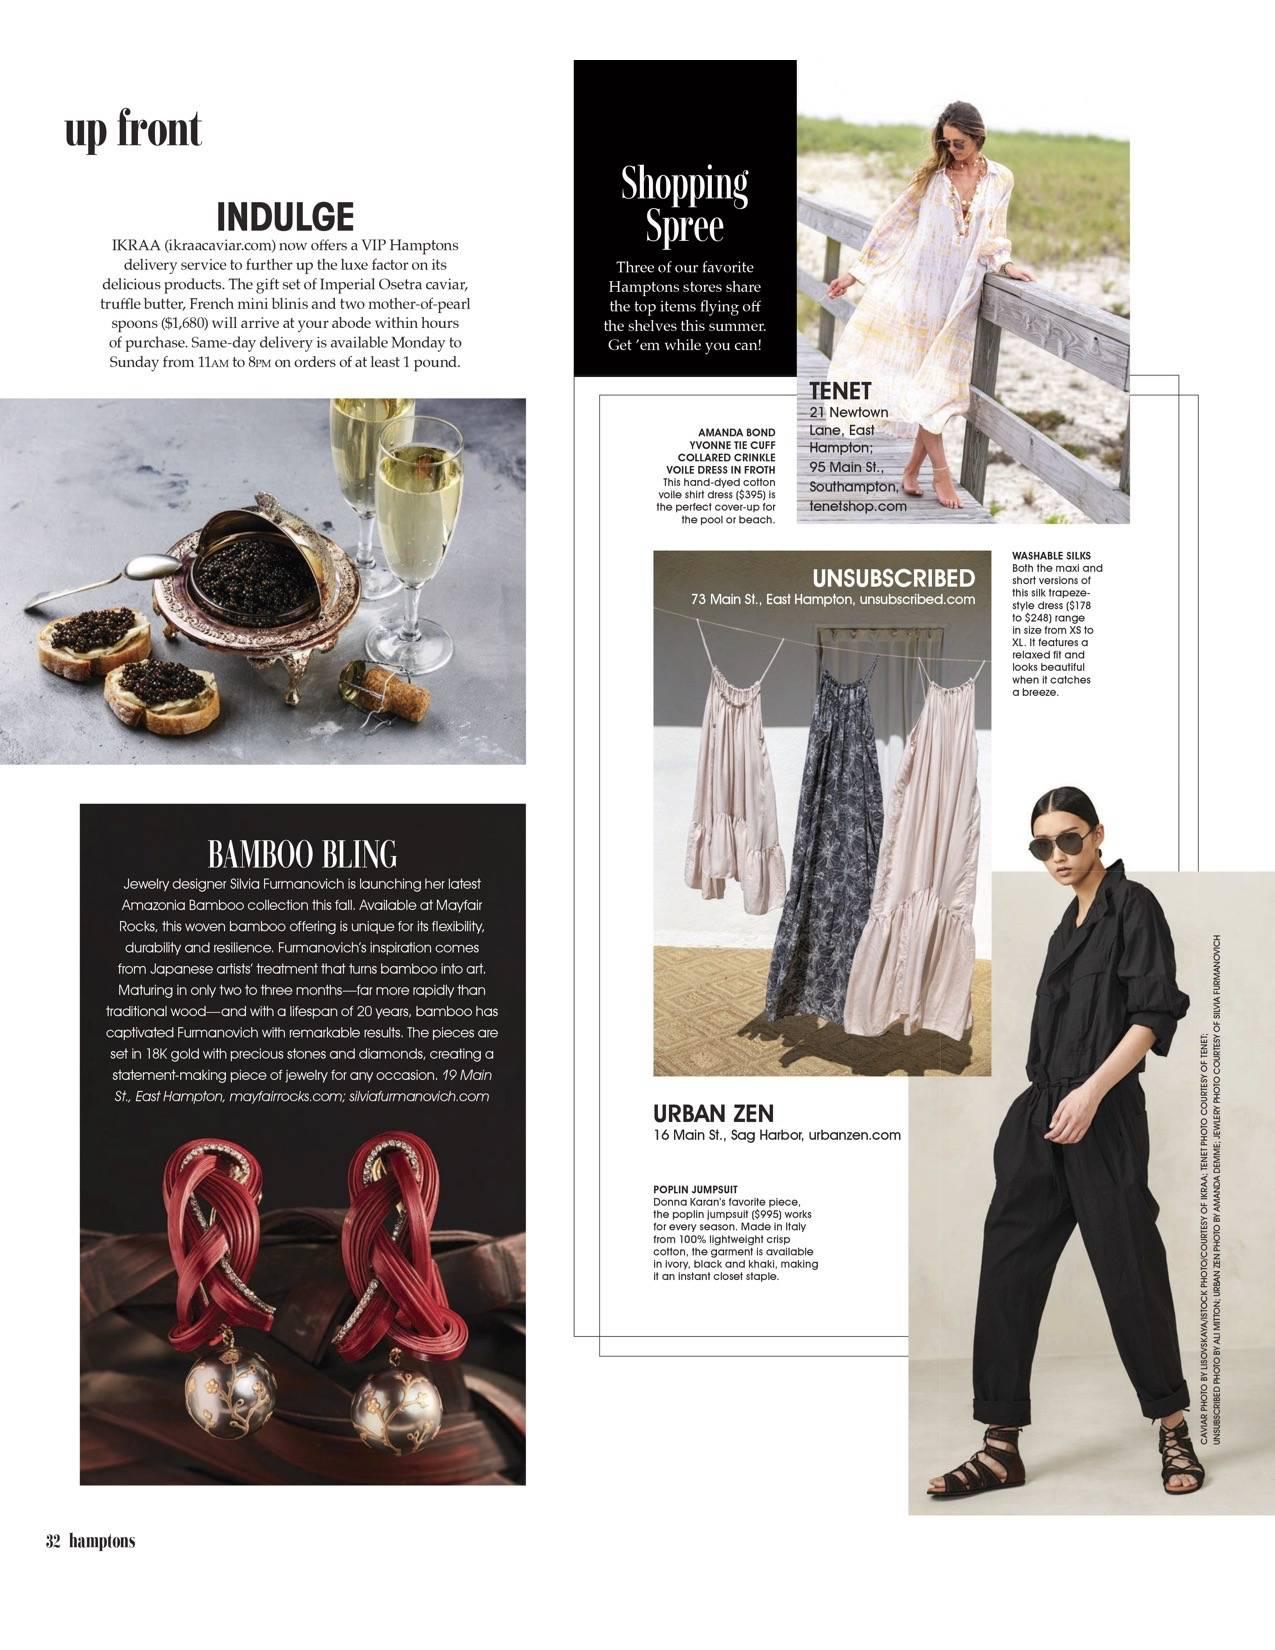 IKRAA caviar in Hamptons magazine. VIP Caviar delivery